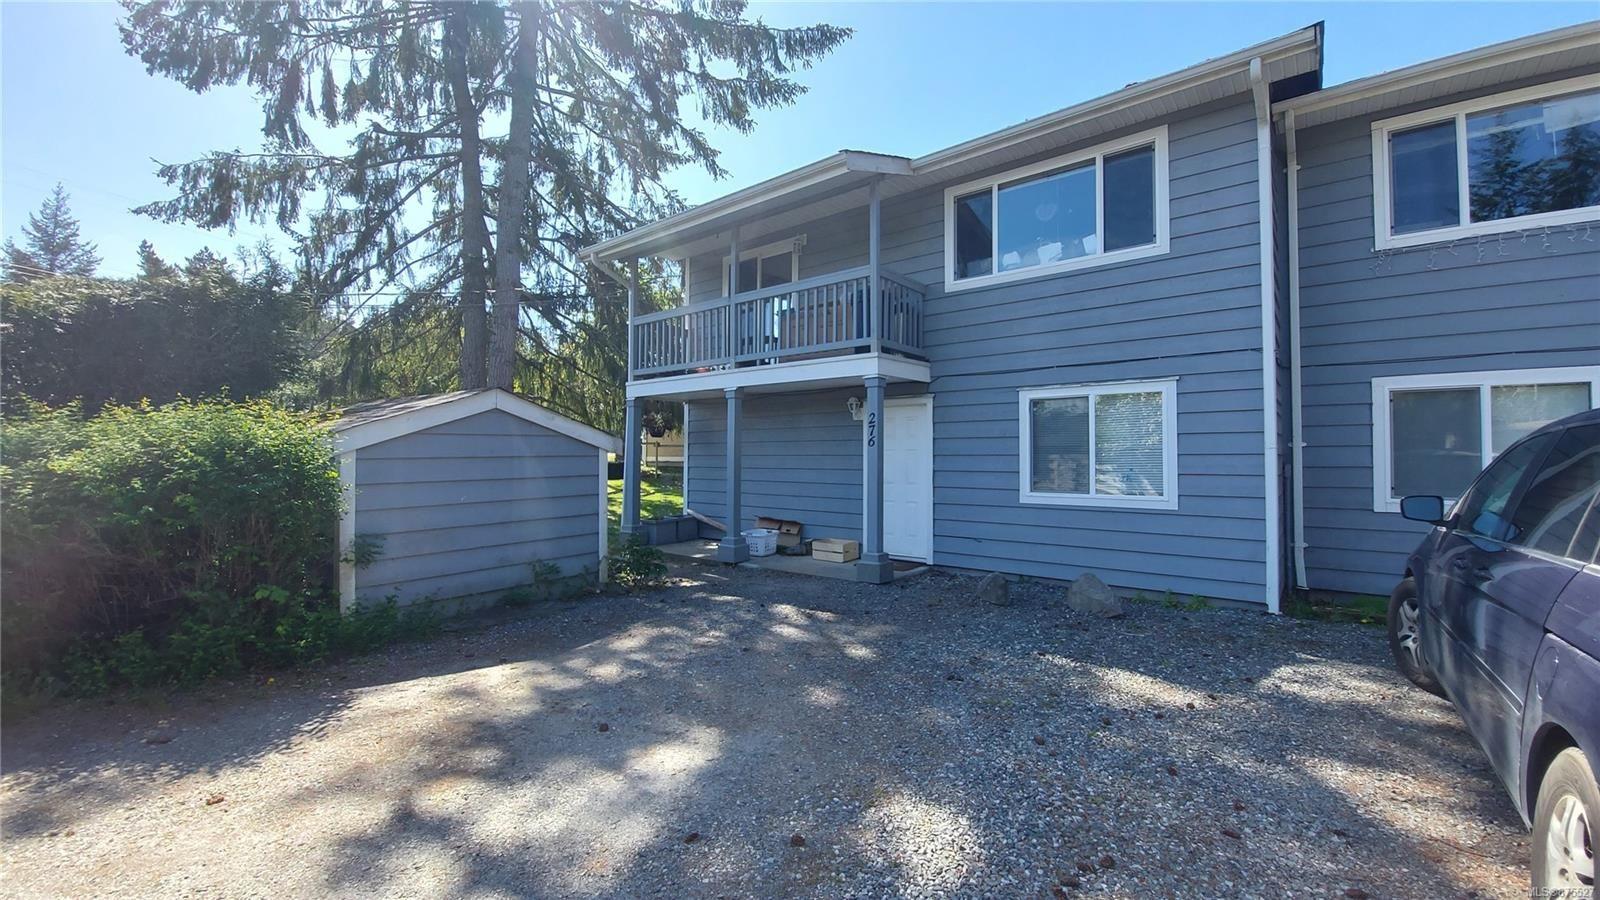 Main Photo: 276 Maliview Dr in : GI Salt Spring Half Duplex for sale (Gulf Islands)  : MLS®# 875527